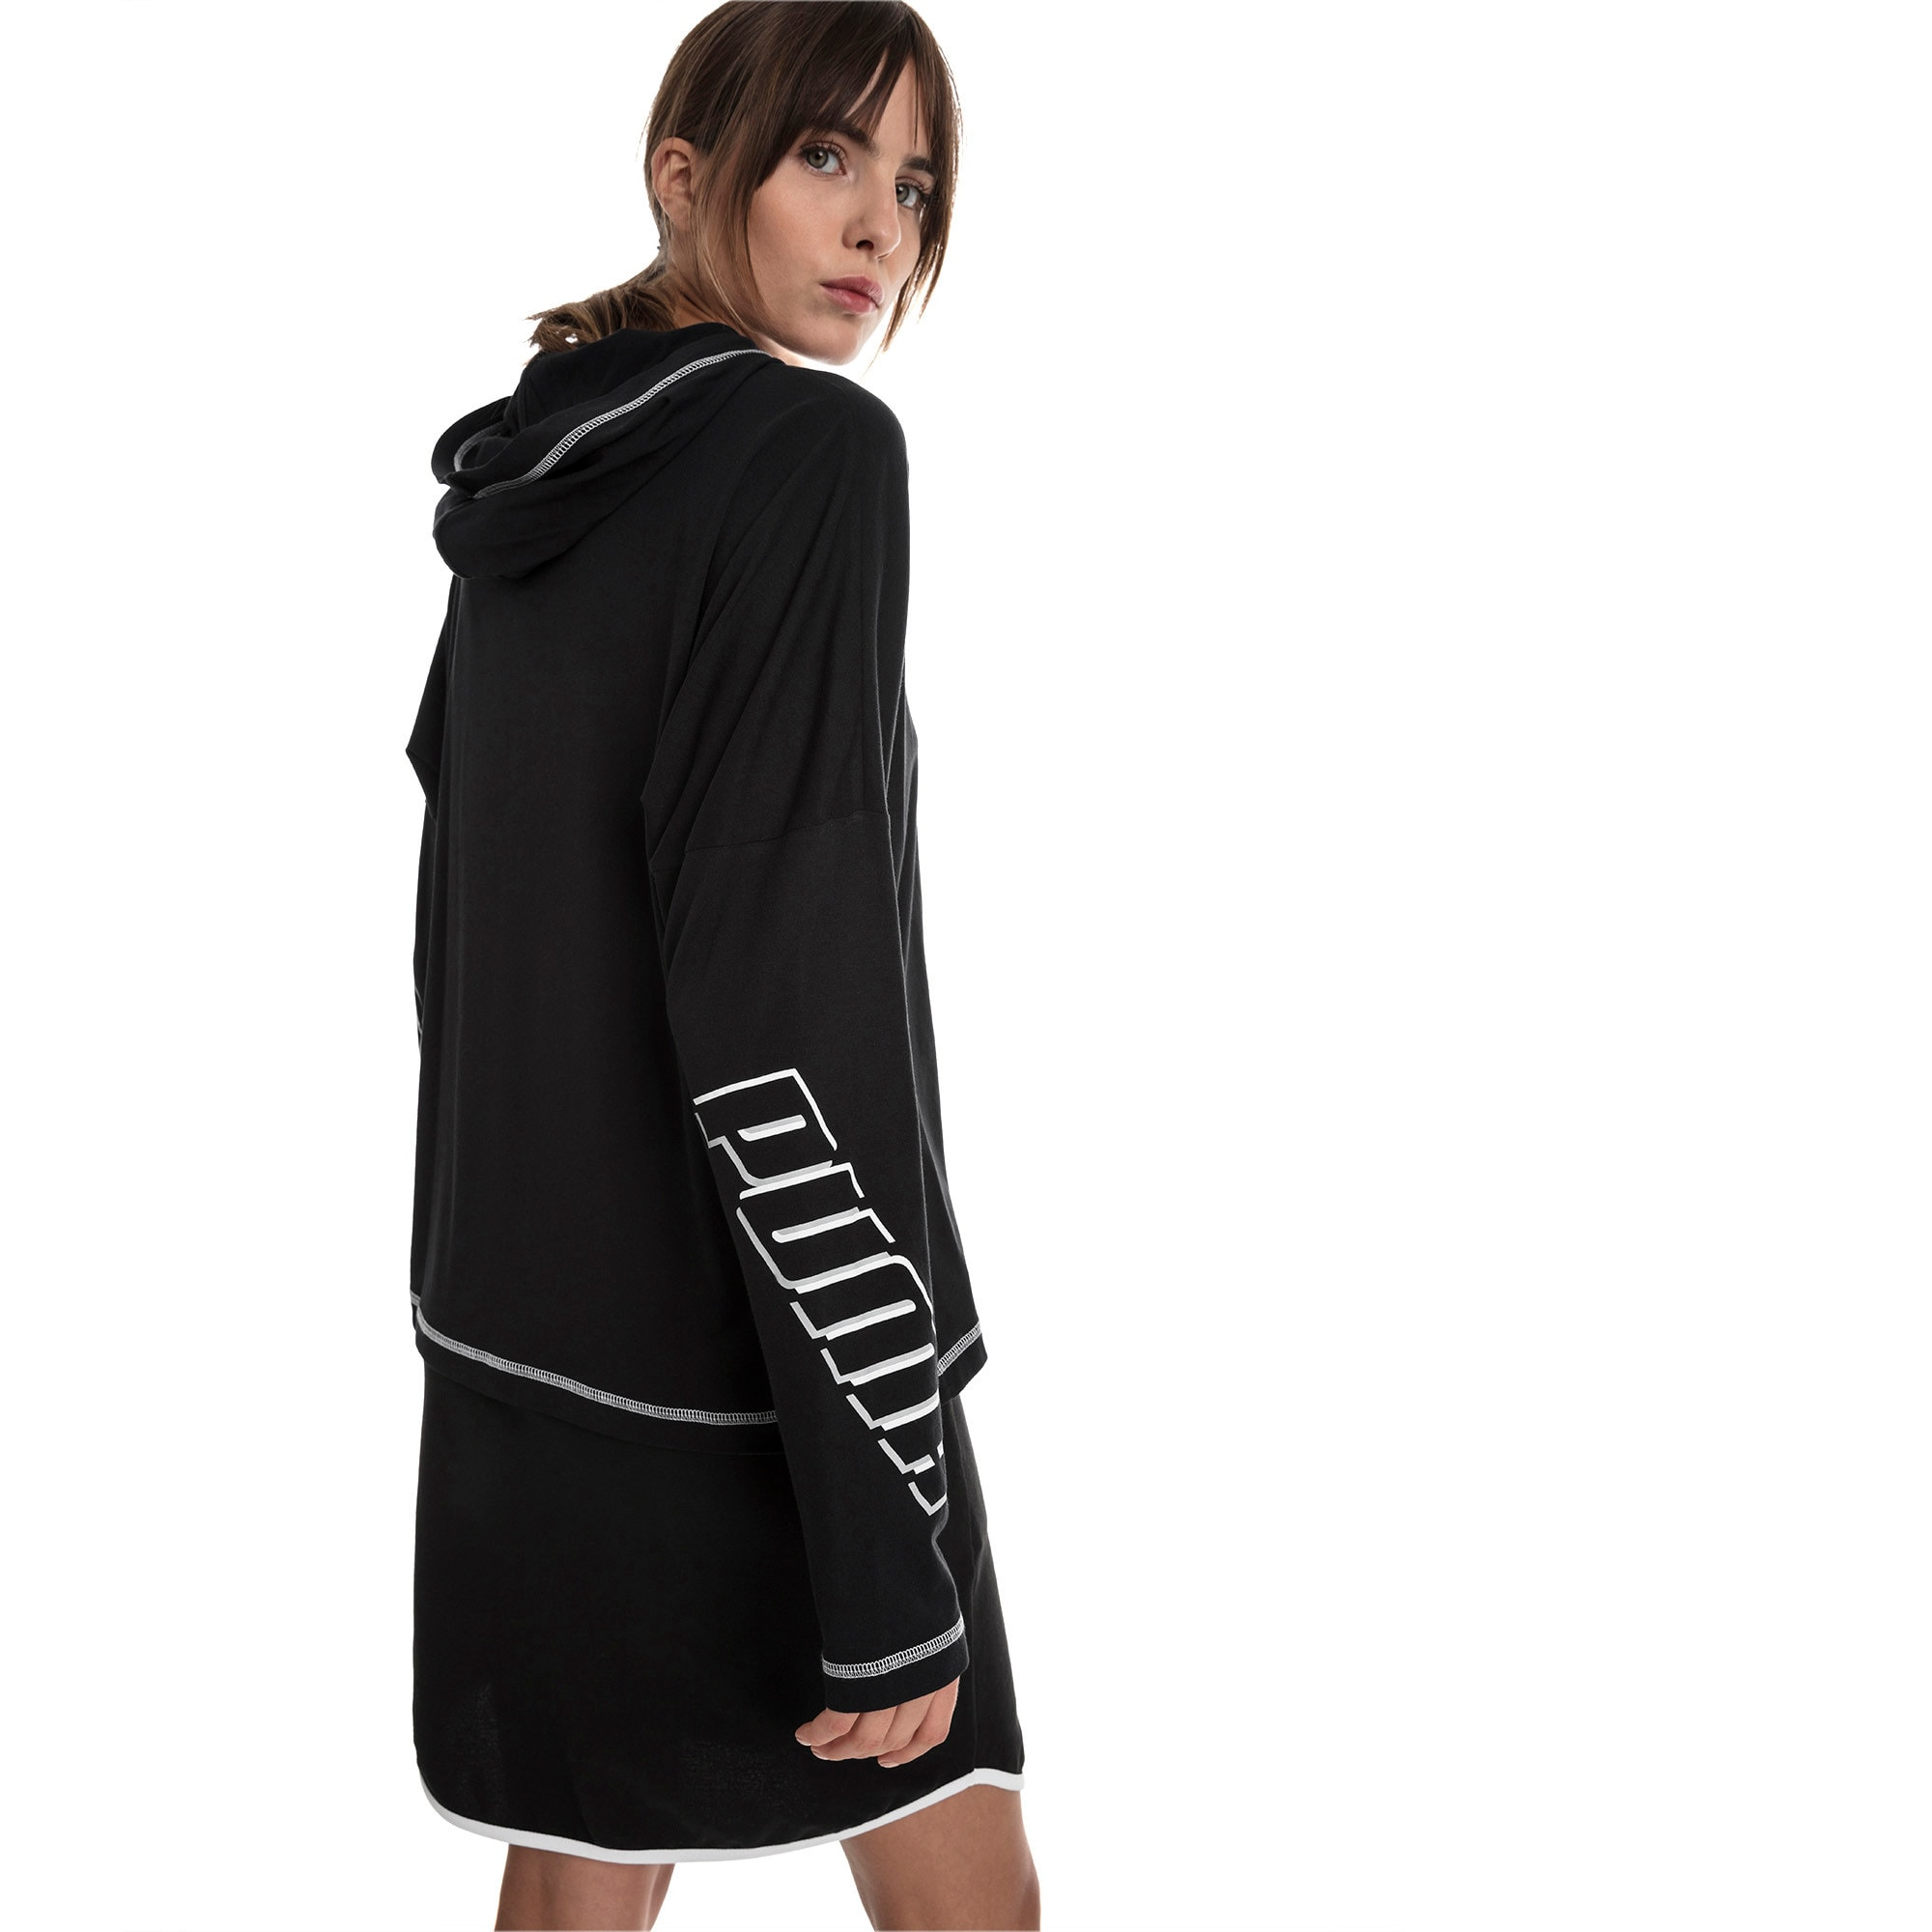 Miniatura 2 de Top liviano Modern Sports para mujer, Cotton Black, mediano